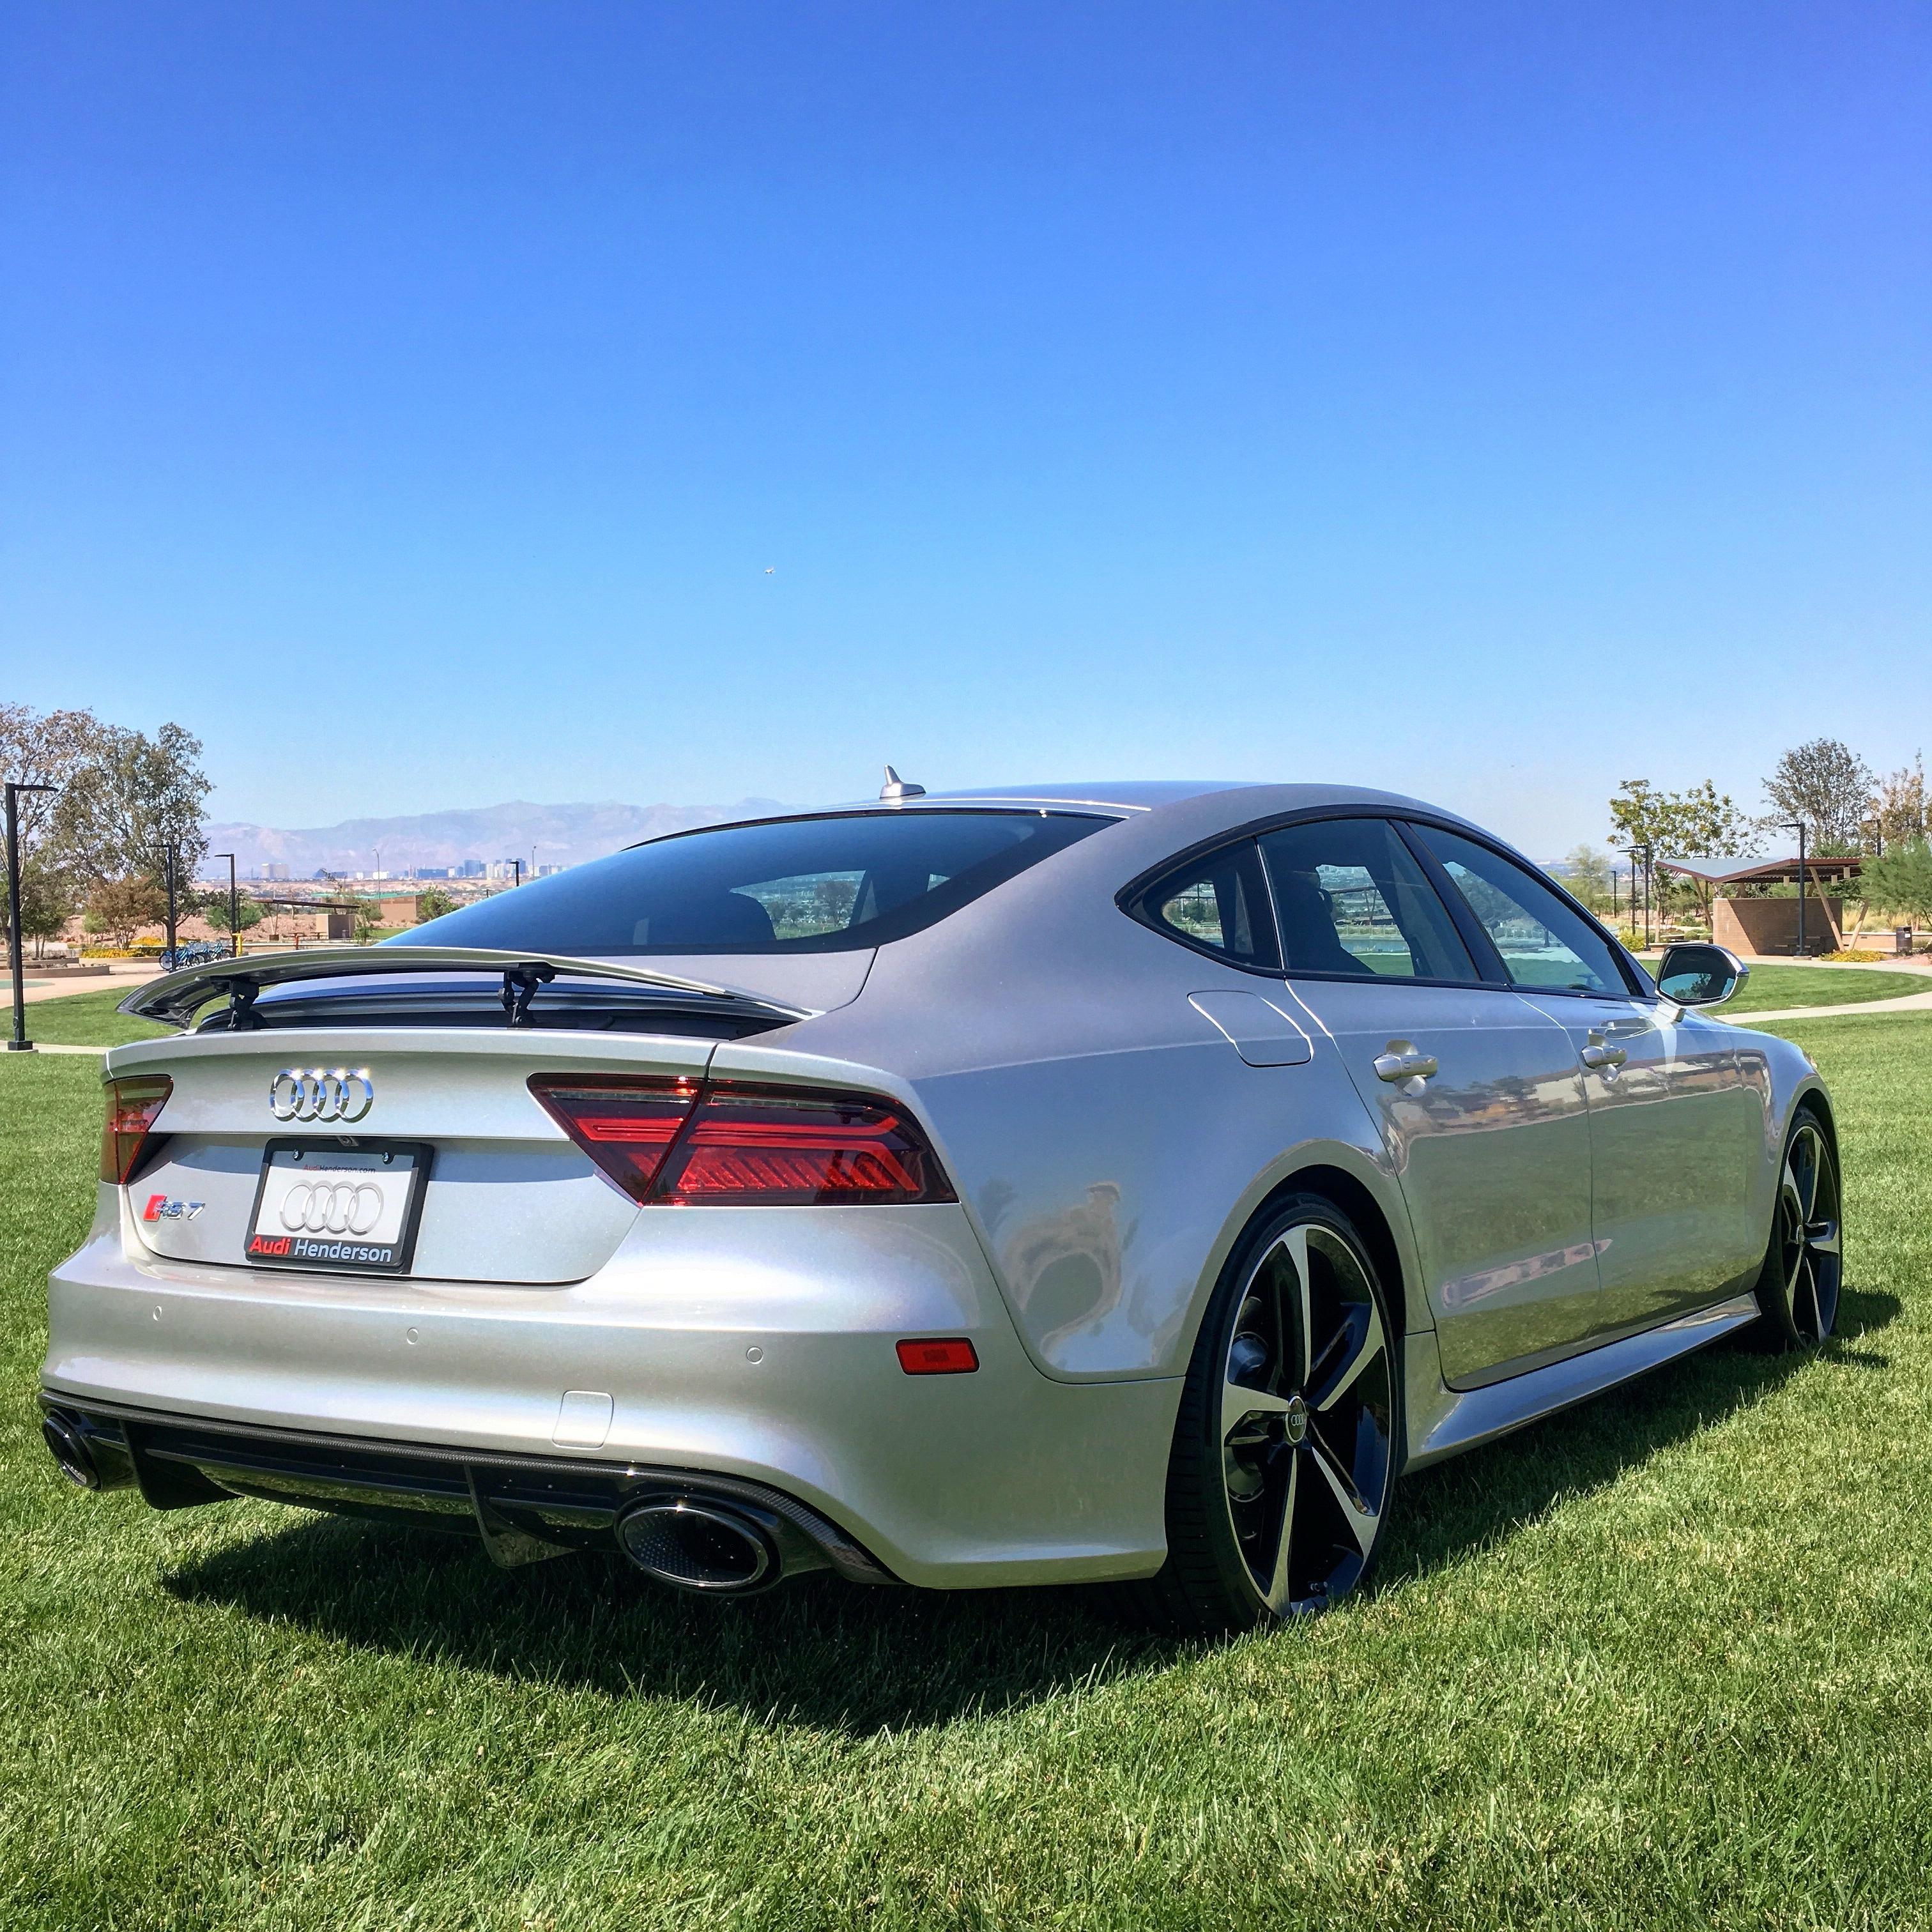 2017 Audi Rs 7 Camshaft: 2017 Audi RS7 Performance